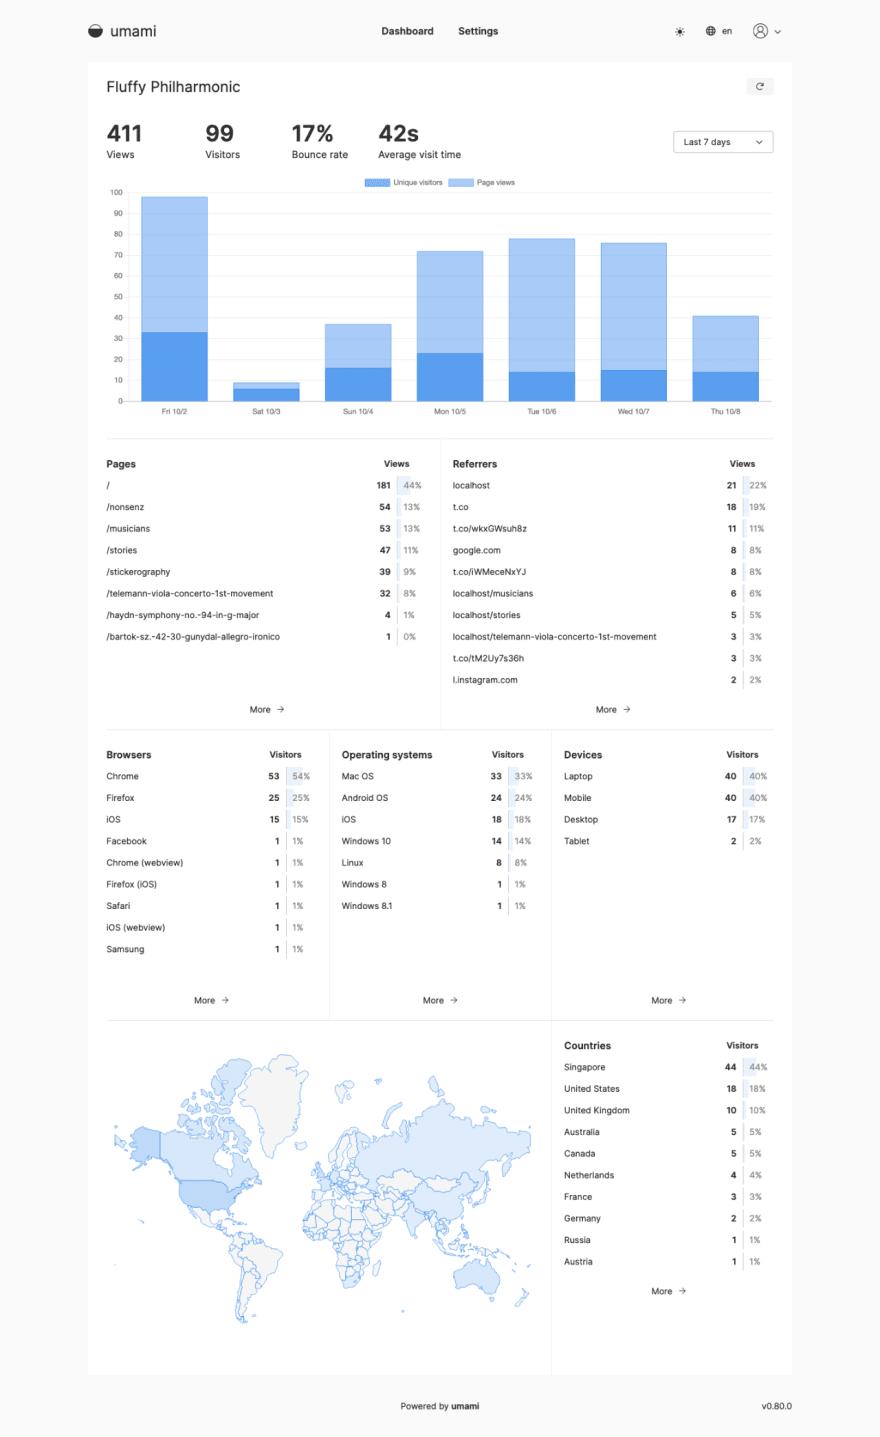 umami analytics dashboard